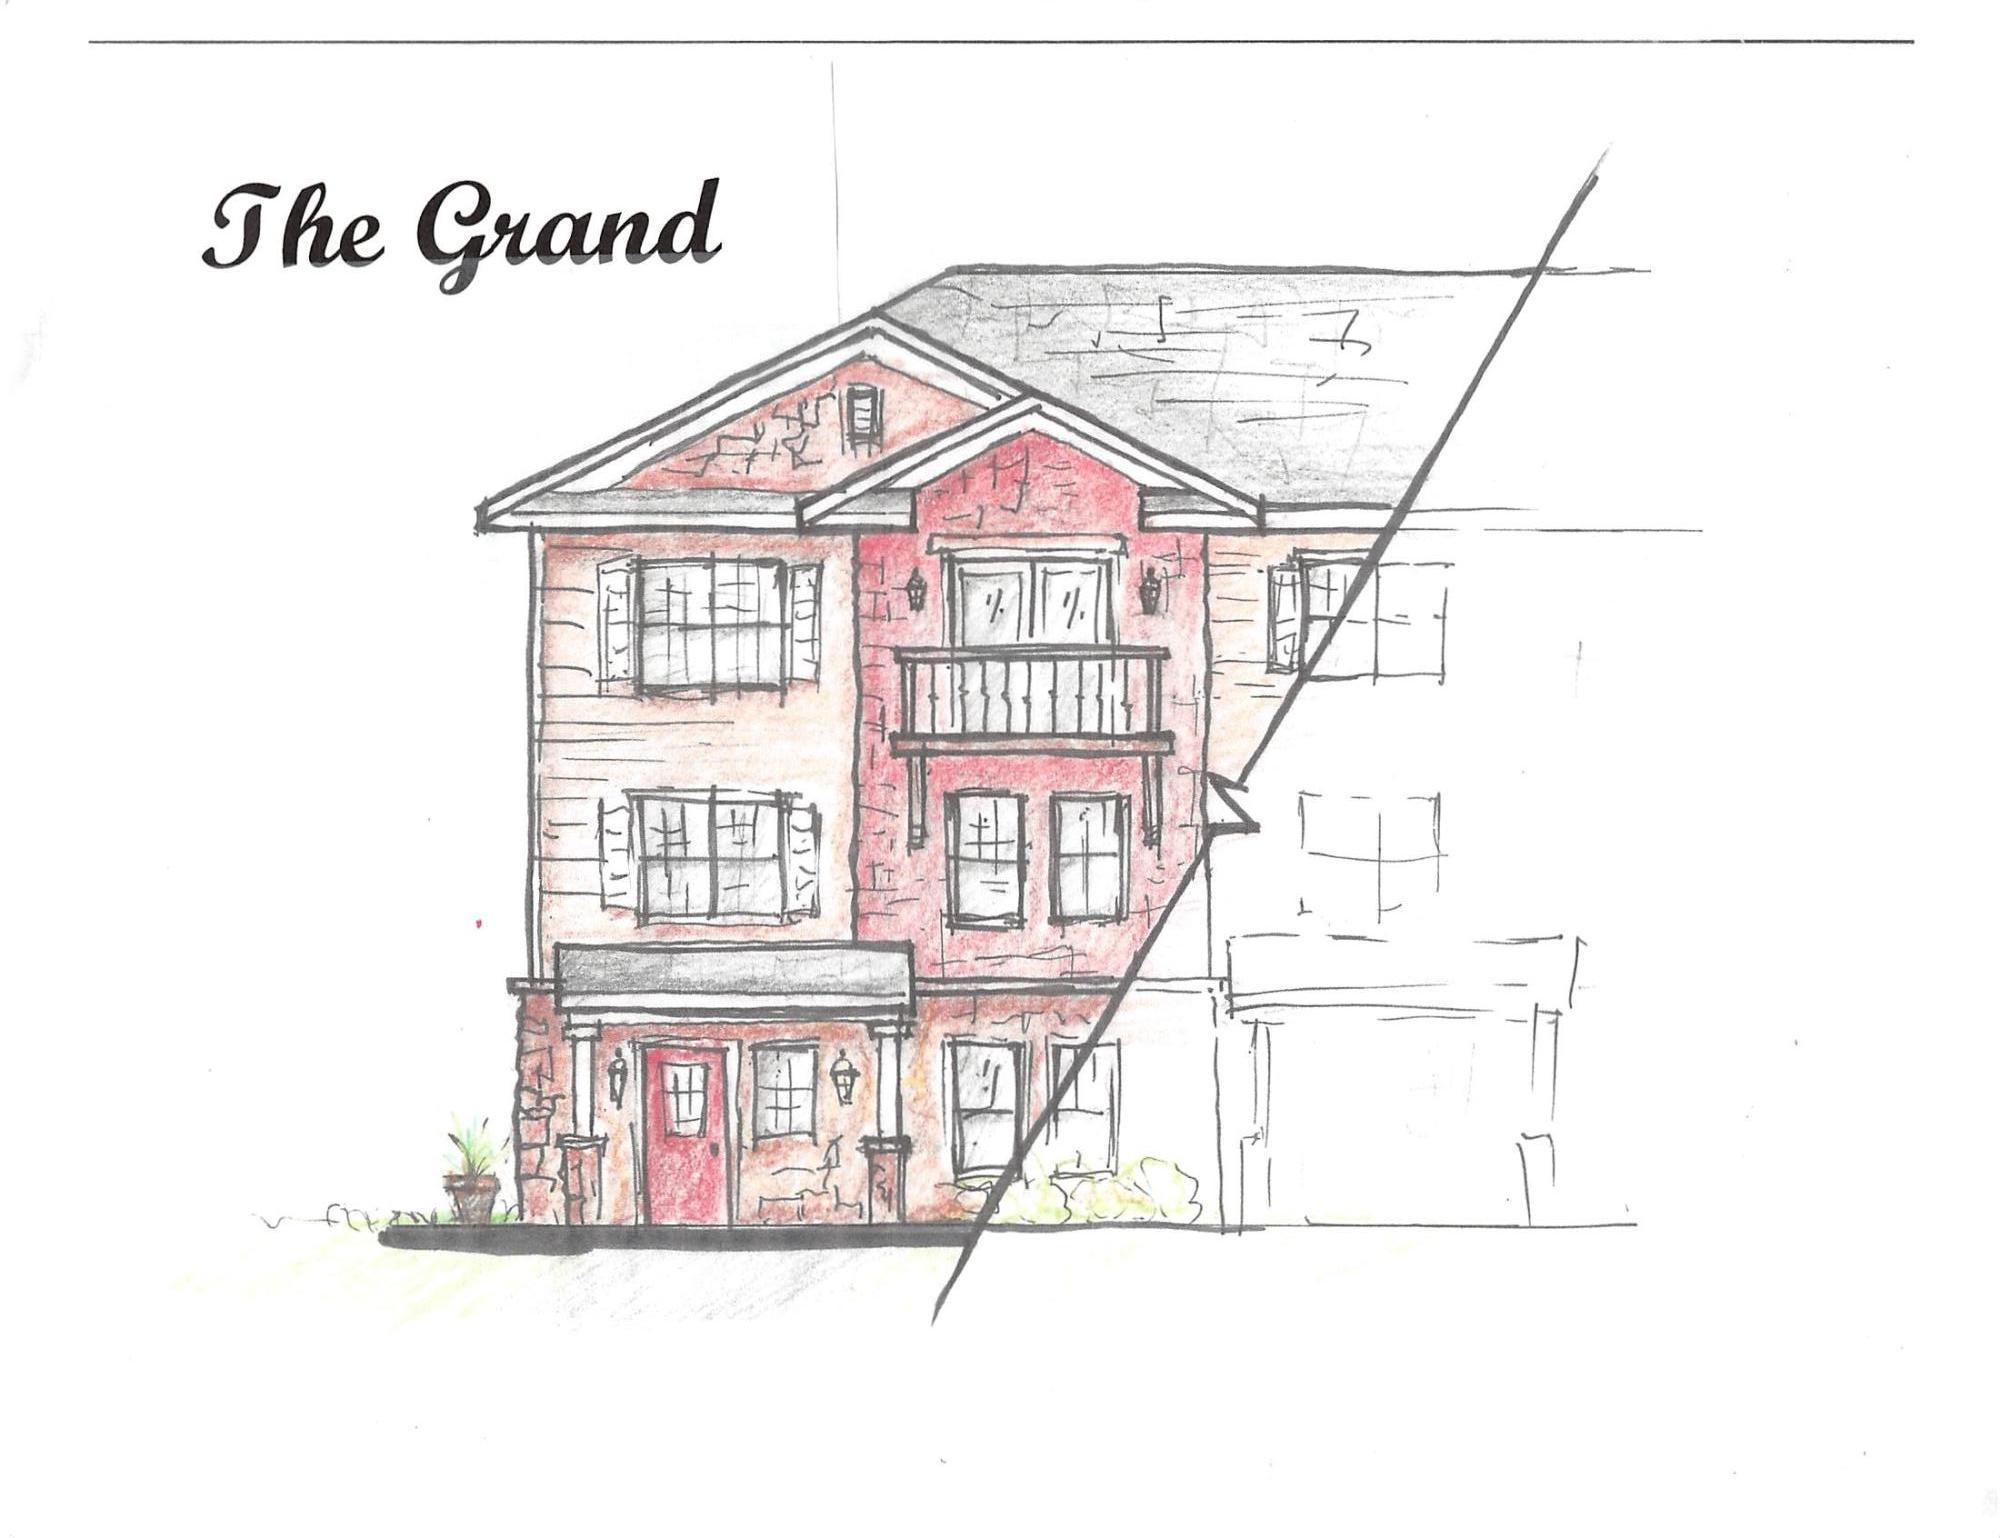 208 Grand Ave, Mukwonago, Wisconsin 53149, 2 Bedrooms Bedrooms, ,2 BathroomsBathrooms,Condominiums,For Sale,Grand Ave,1,1695816